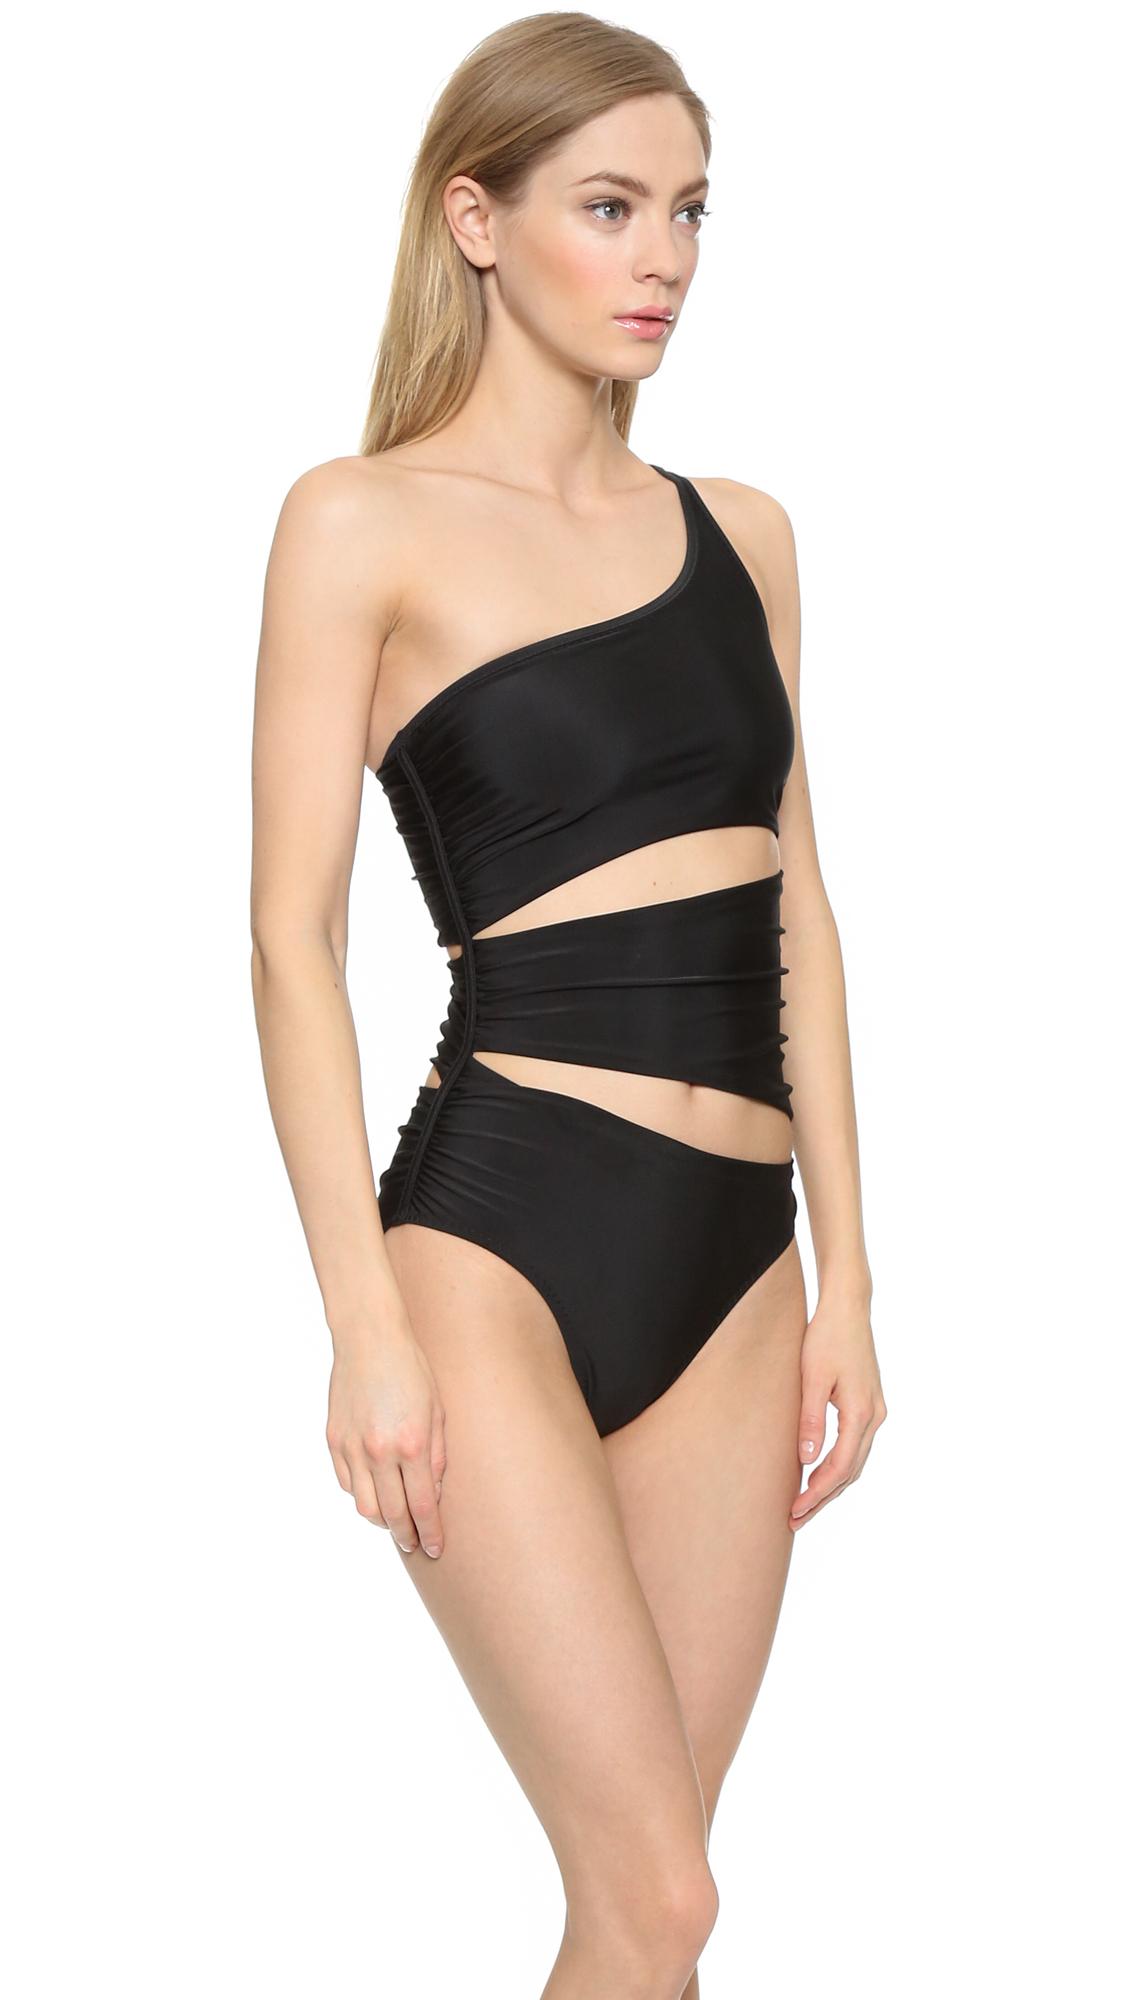 fe4cba2982422 Lyst - adidas By Stella McCartney One Shoulder Swimsuit - Black in Black